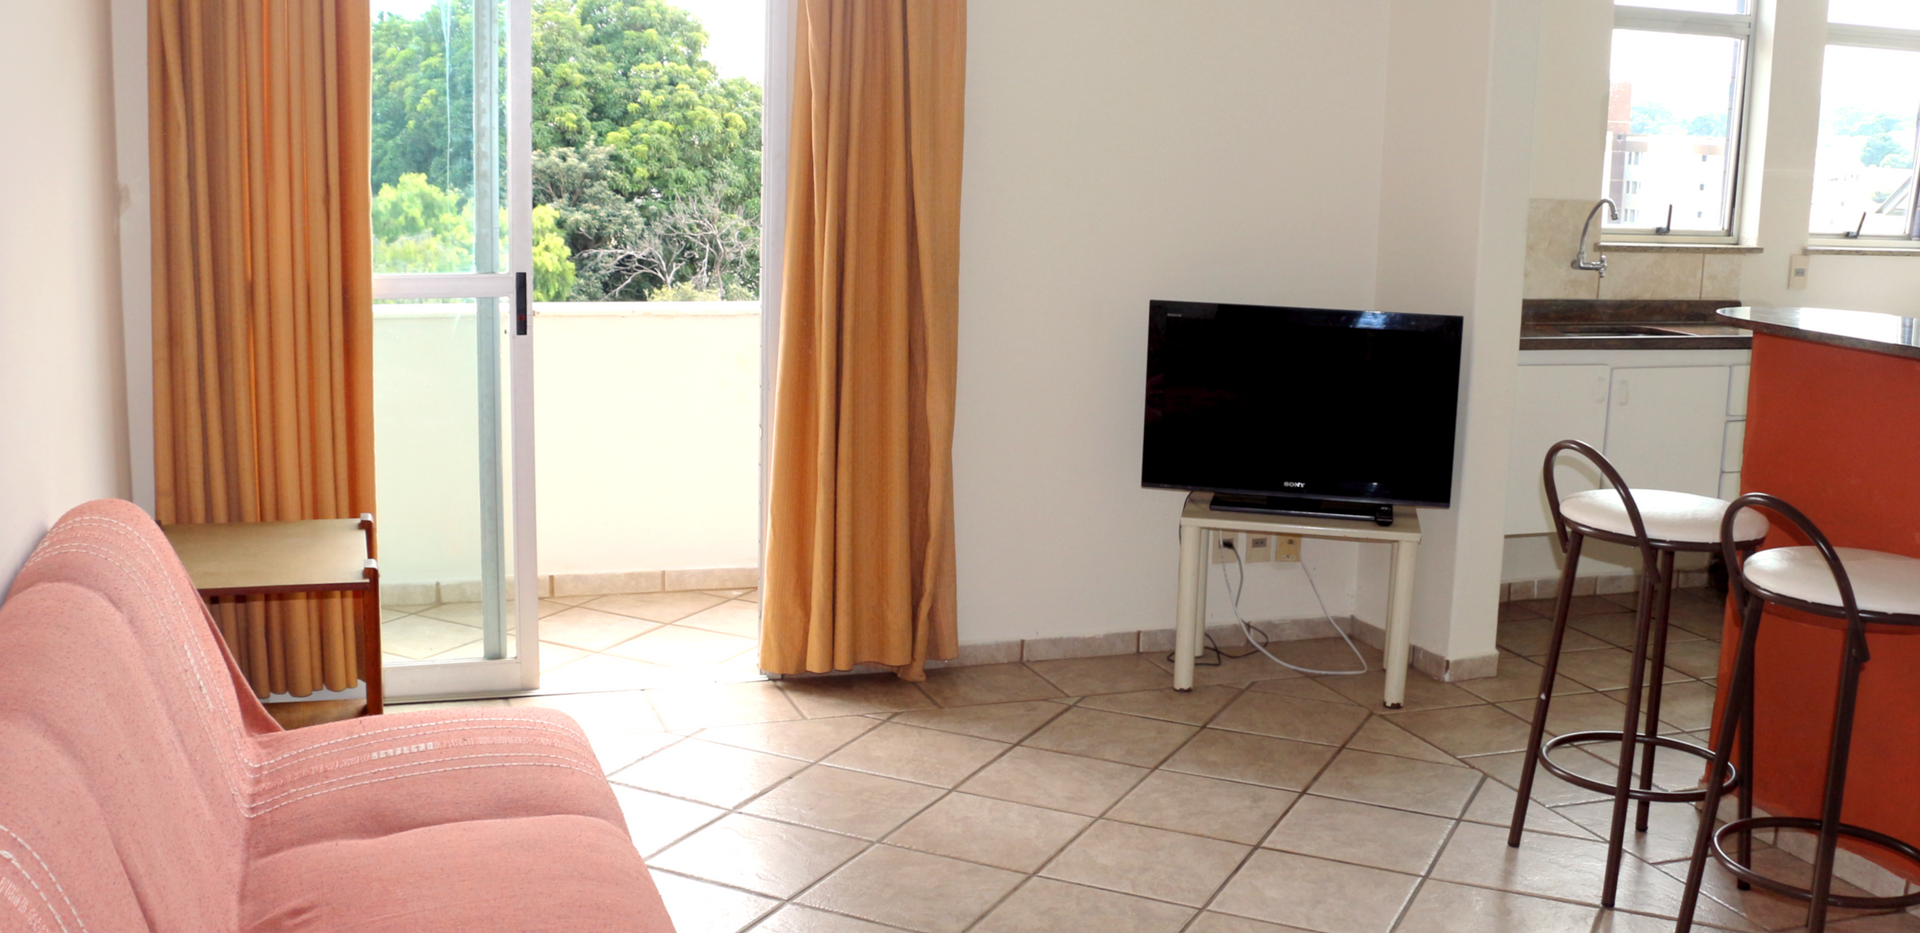 sala flat padrão PRINCIPAL.png